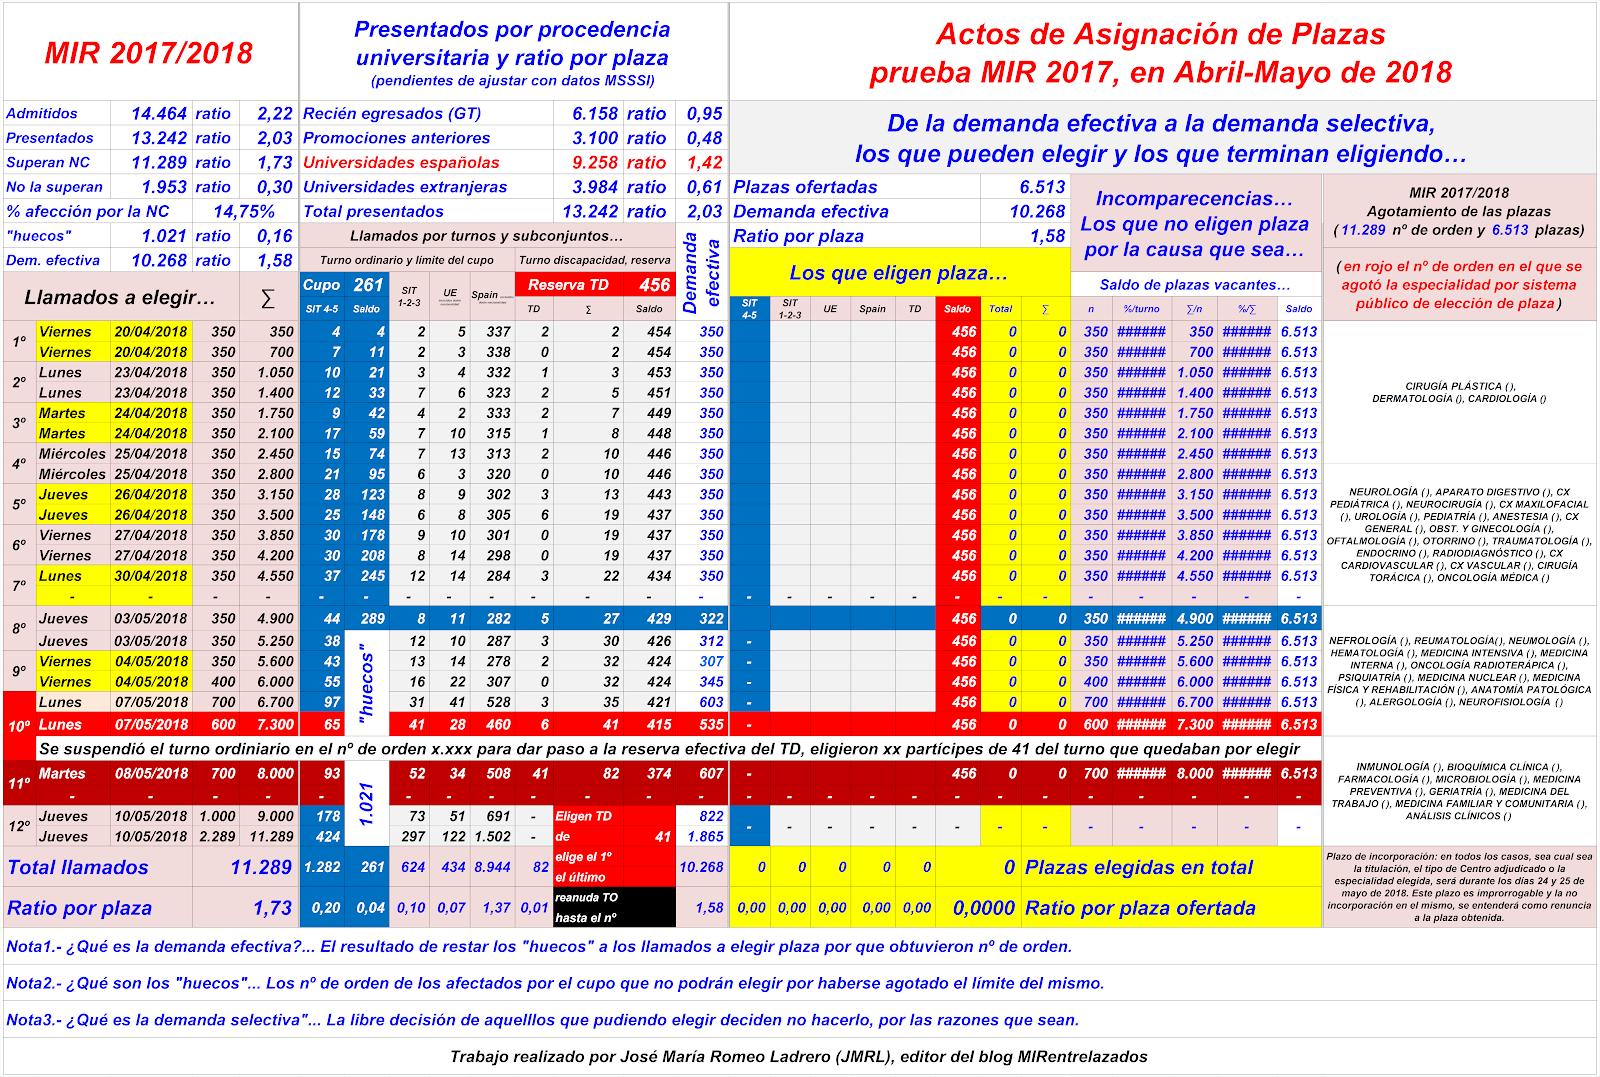 MIRentrelazados: Actos de Asignación de Plazas, MIR 2016/2017...